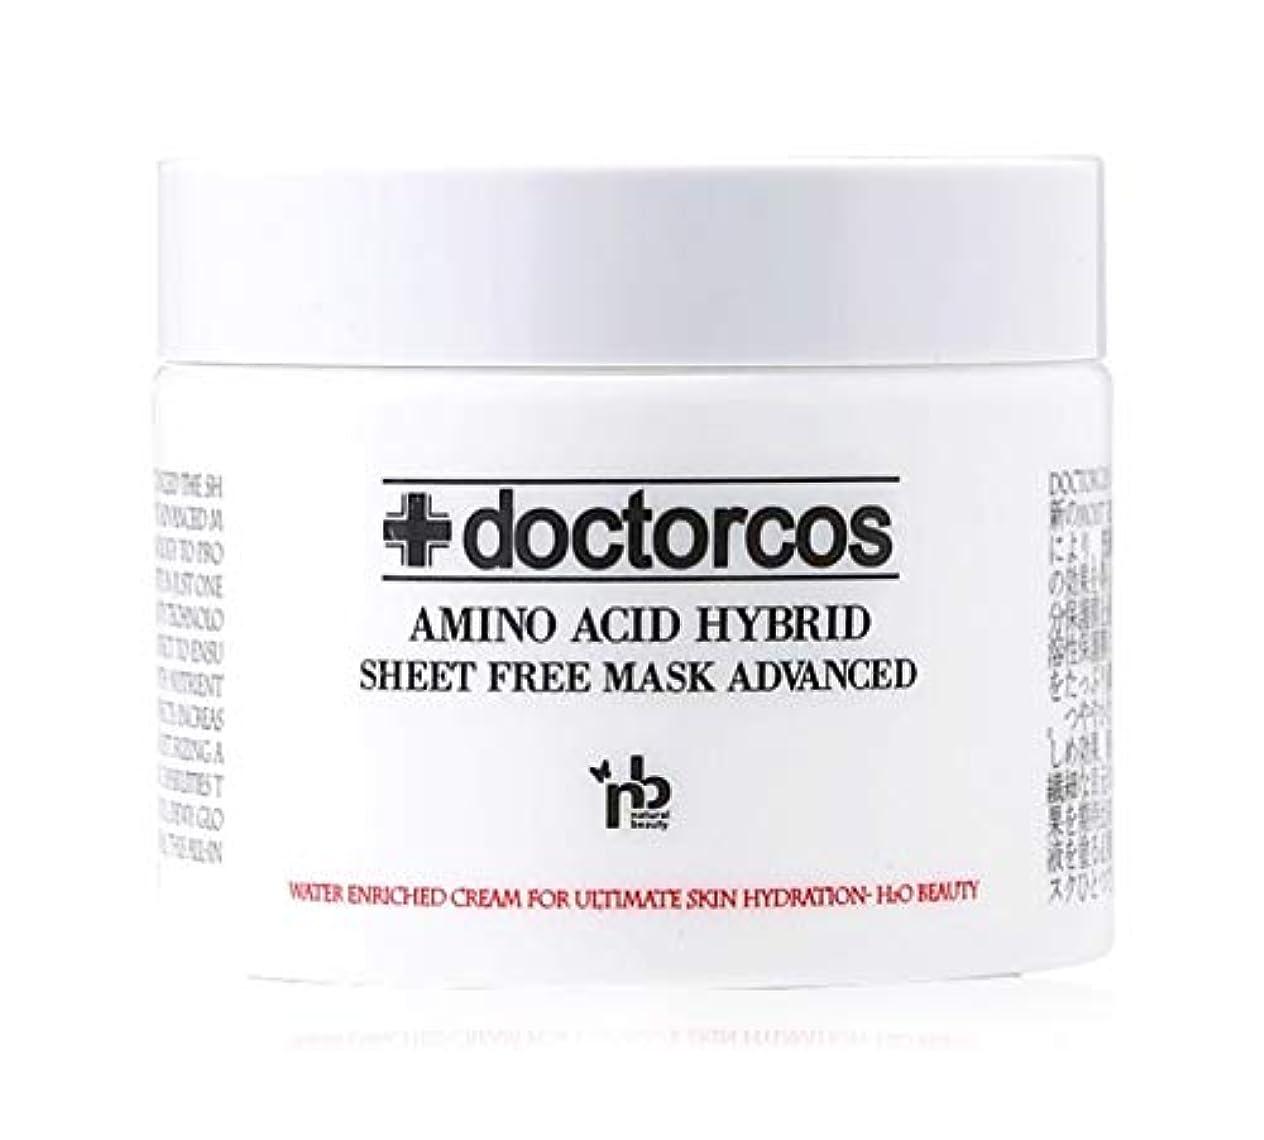 DOCTORCOS ドクターコス アミノ酸 ハイブリッド シートフリーマスク アドバンスト[並行輸入品]